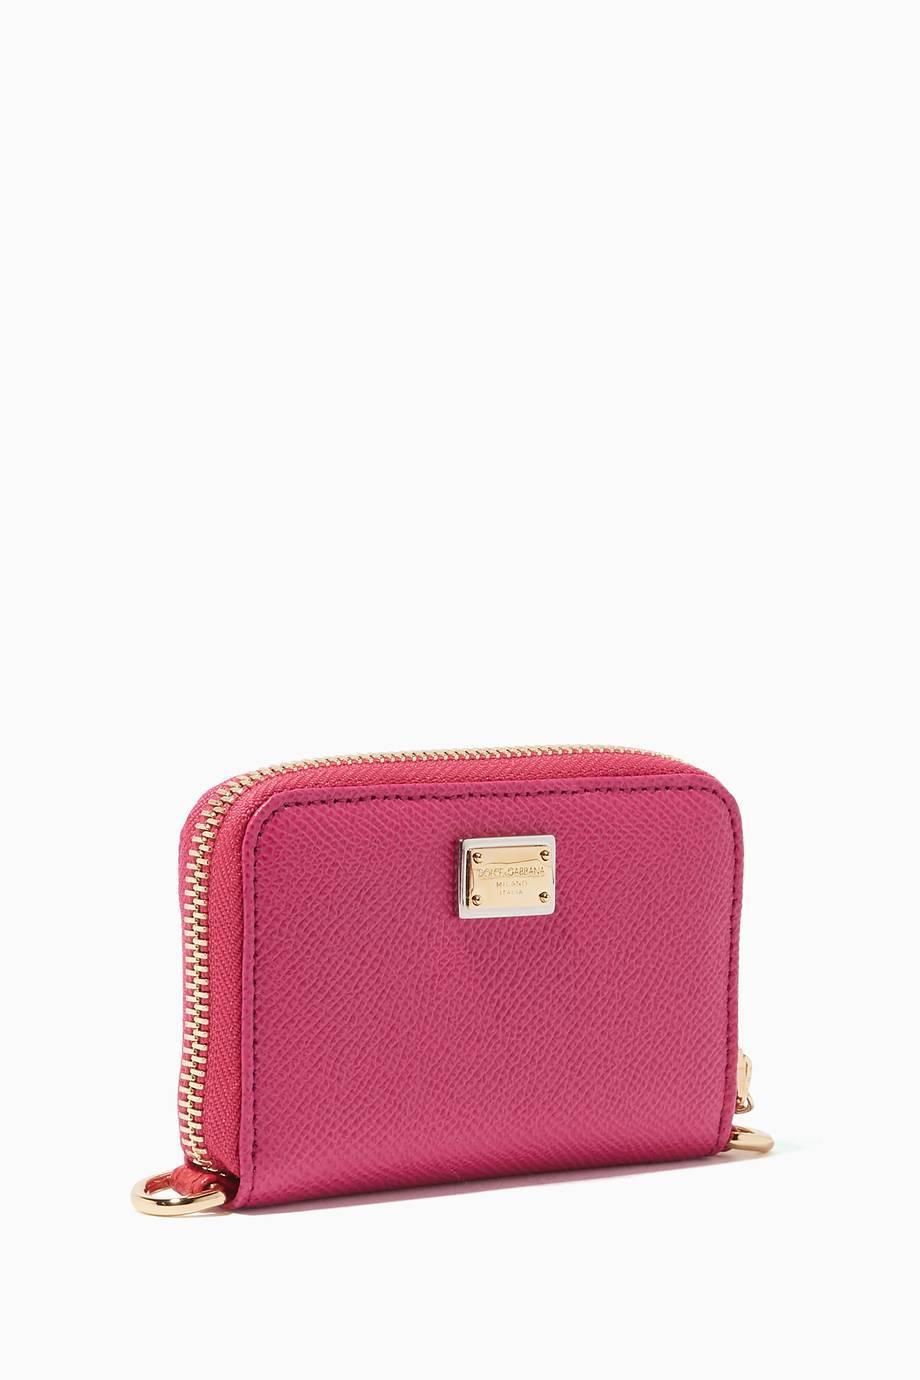 Forever Love purse - Pink & Purple Dolce & Gabbana MN1M72QO8d